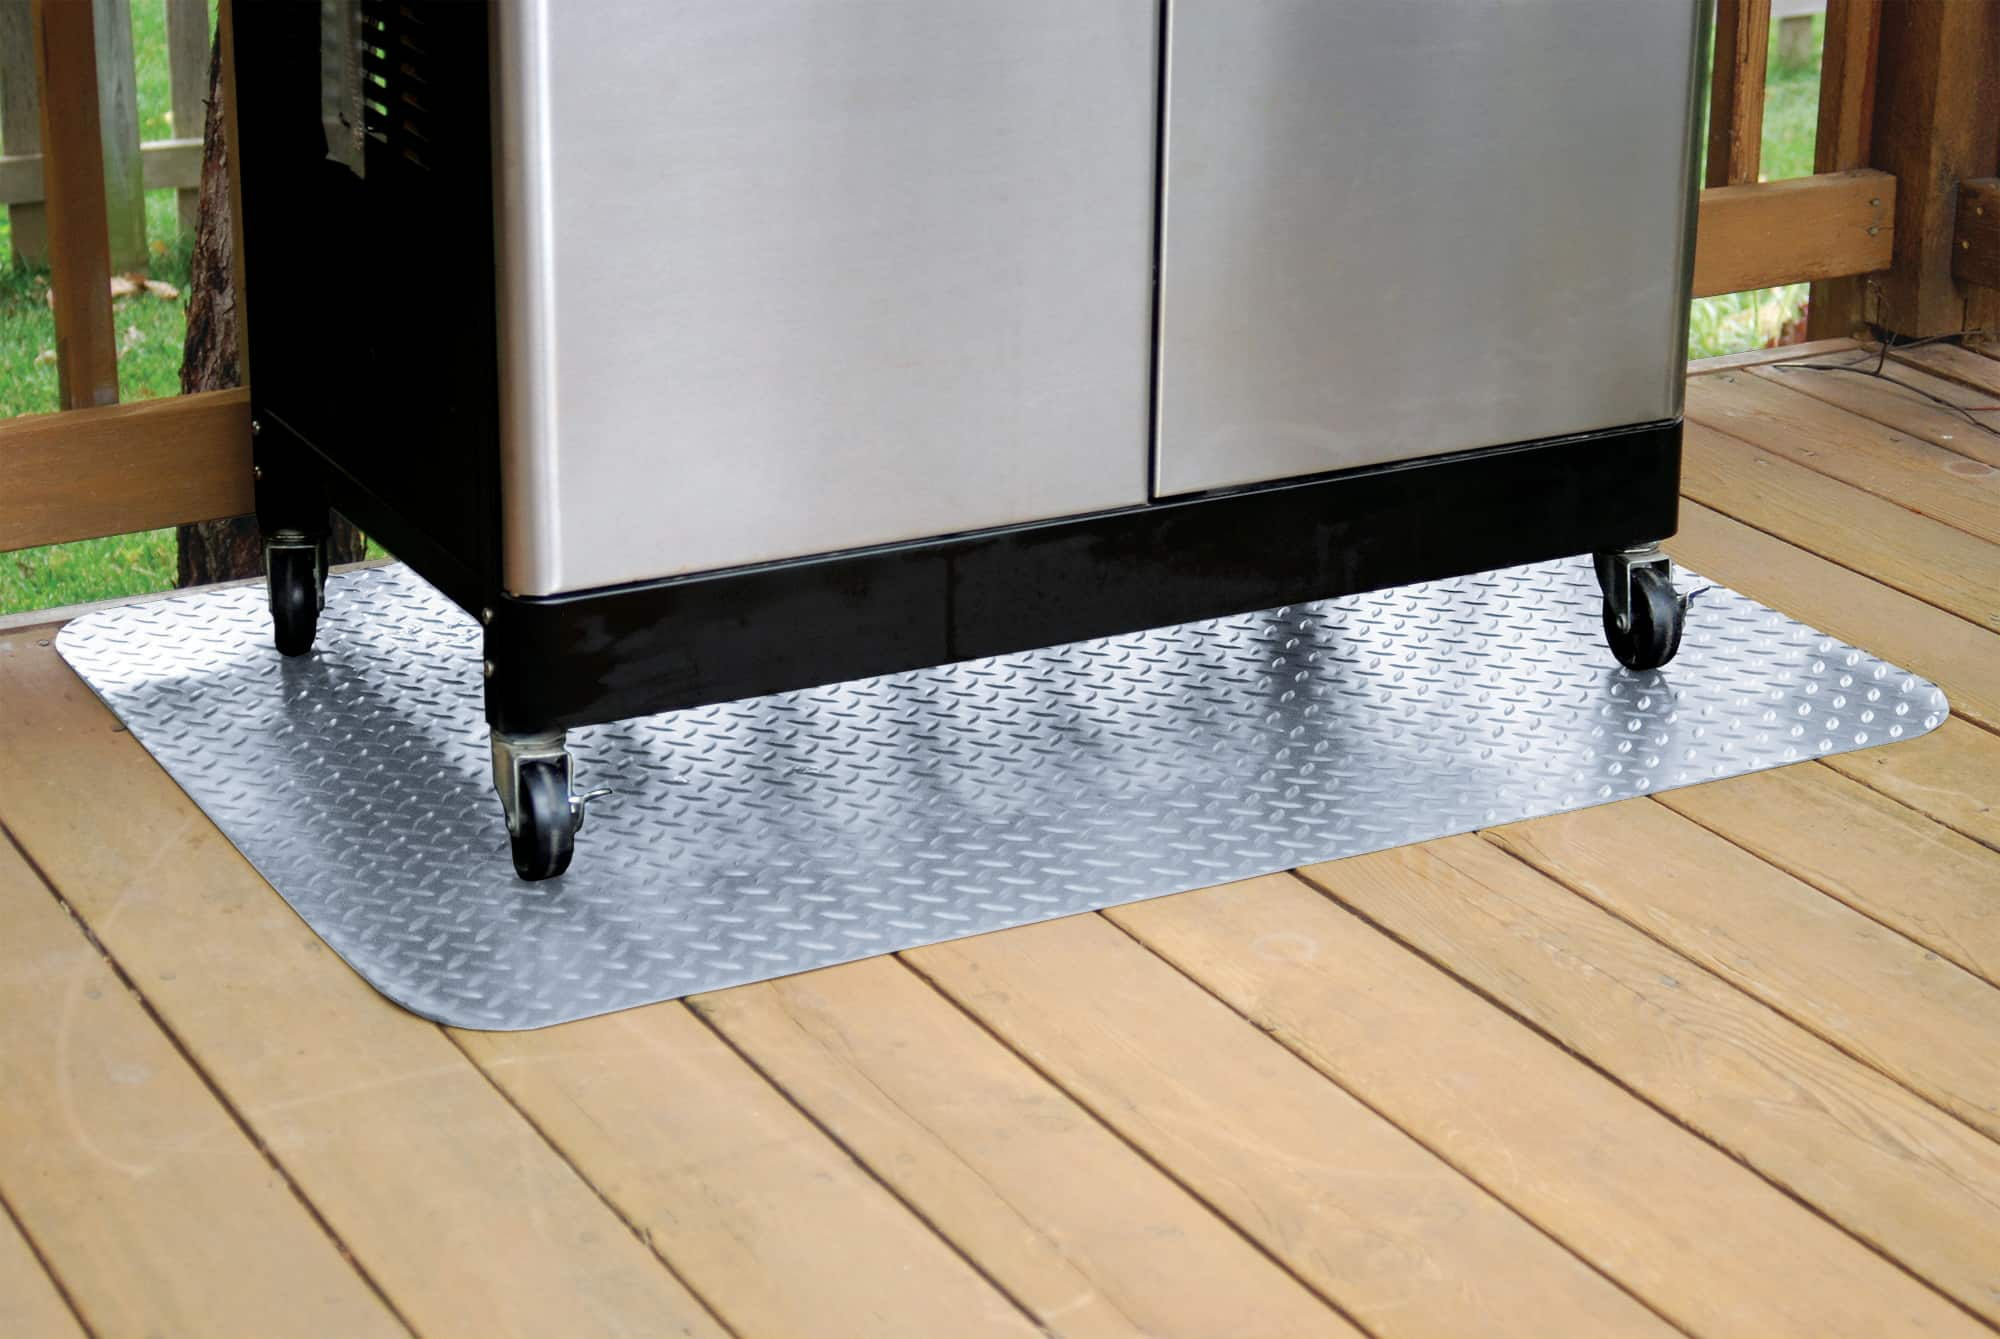 "G-Floor Grill Mat, 47"" x 32"", Diamond Tread, Metallic Silver $8.98"